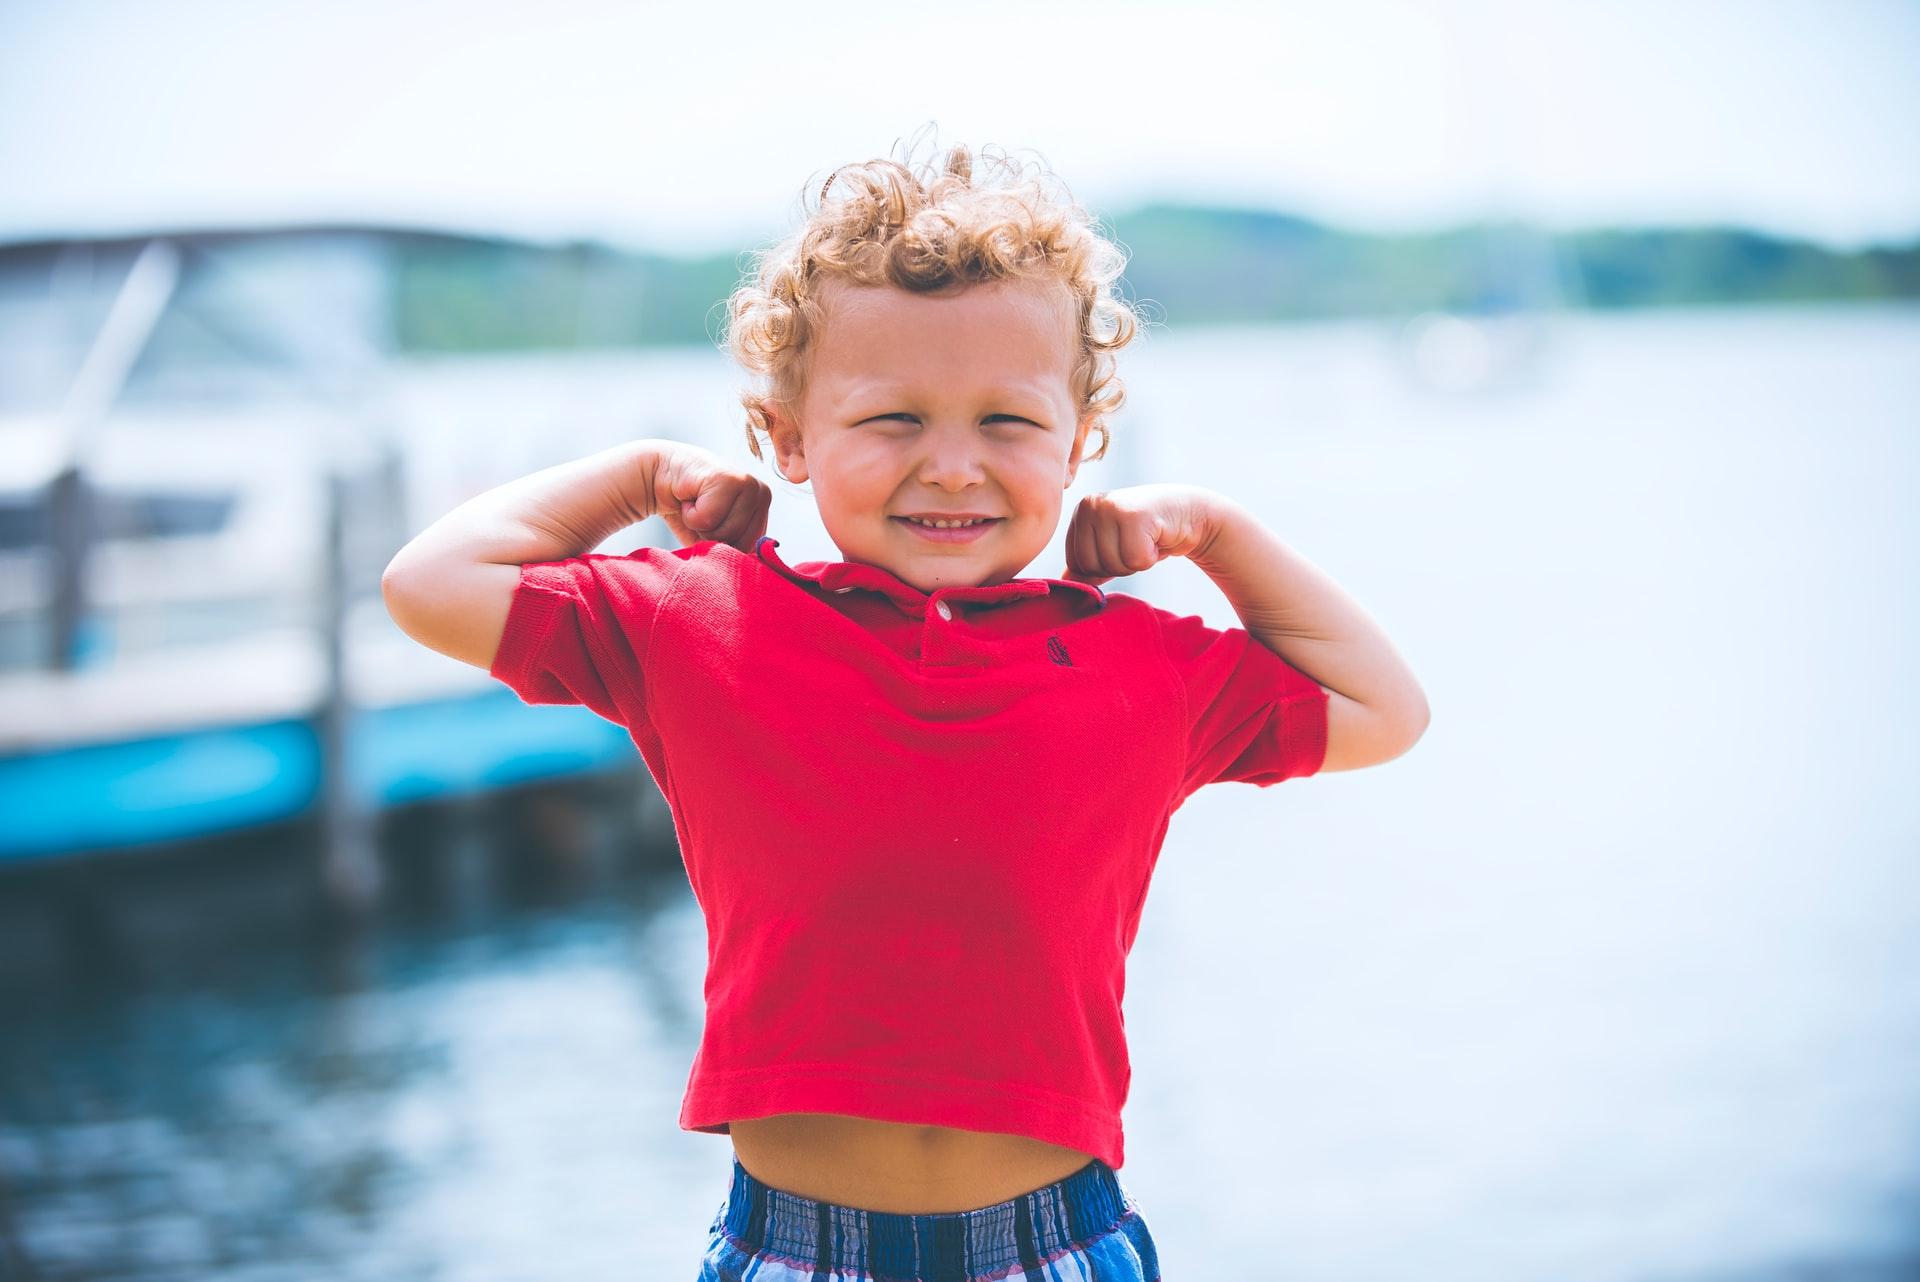 Boy in a red shirt